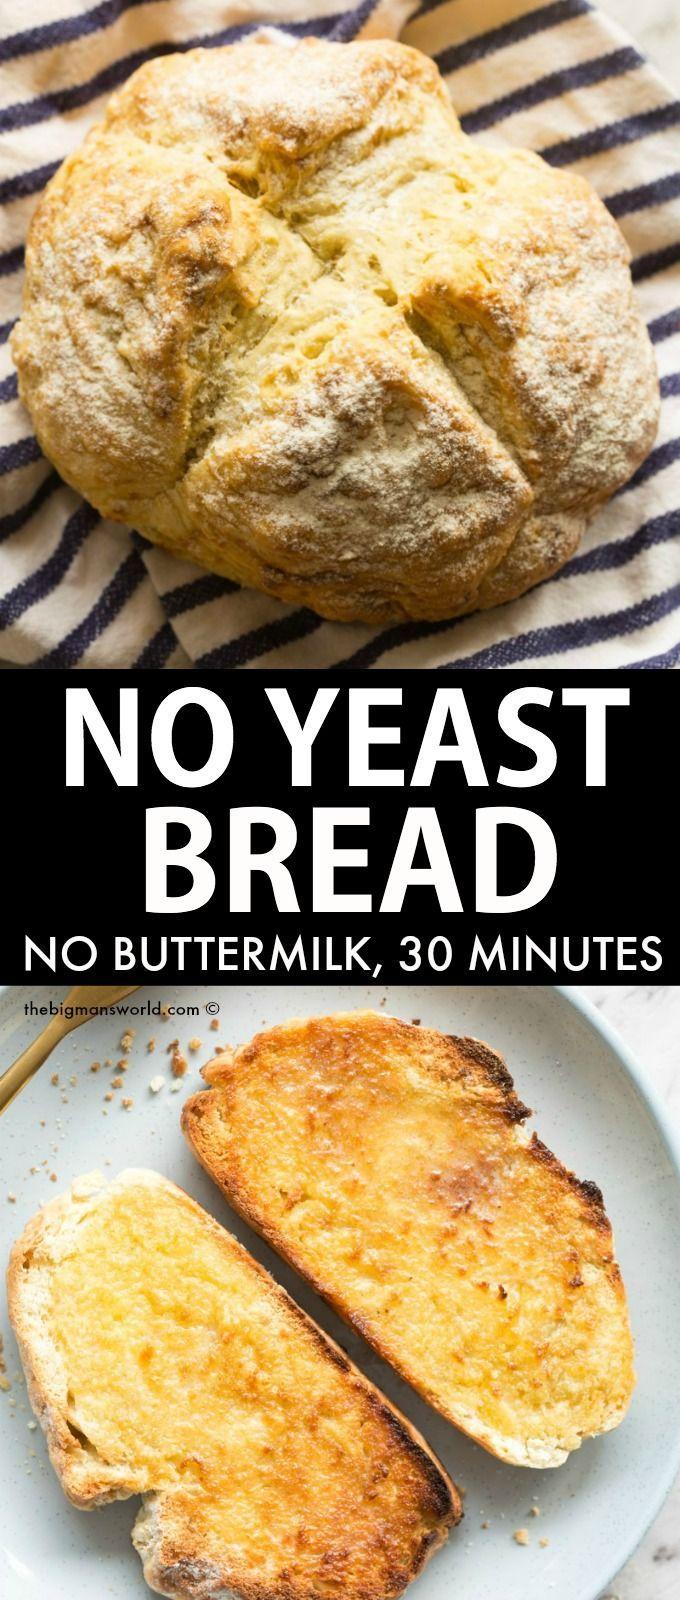 No Yeast Emergency Bread Recipe Quick Easy And No Fancy Gadgets Needed No Buttermilk No Eg In 2020 Yeast Free Breads Gluten Free Bread Recipe Easy Dairy Free Bread